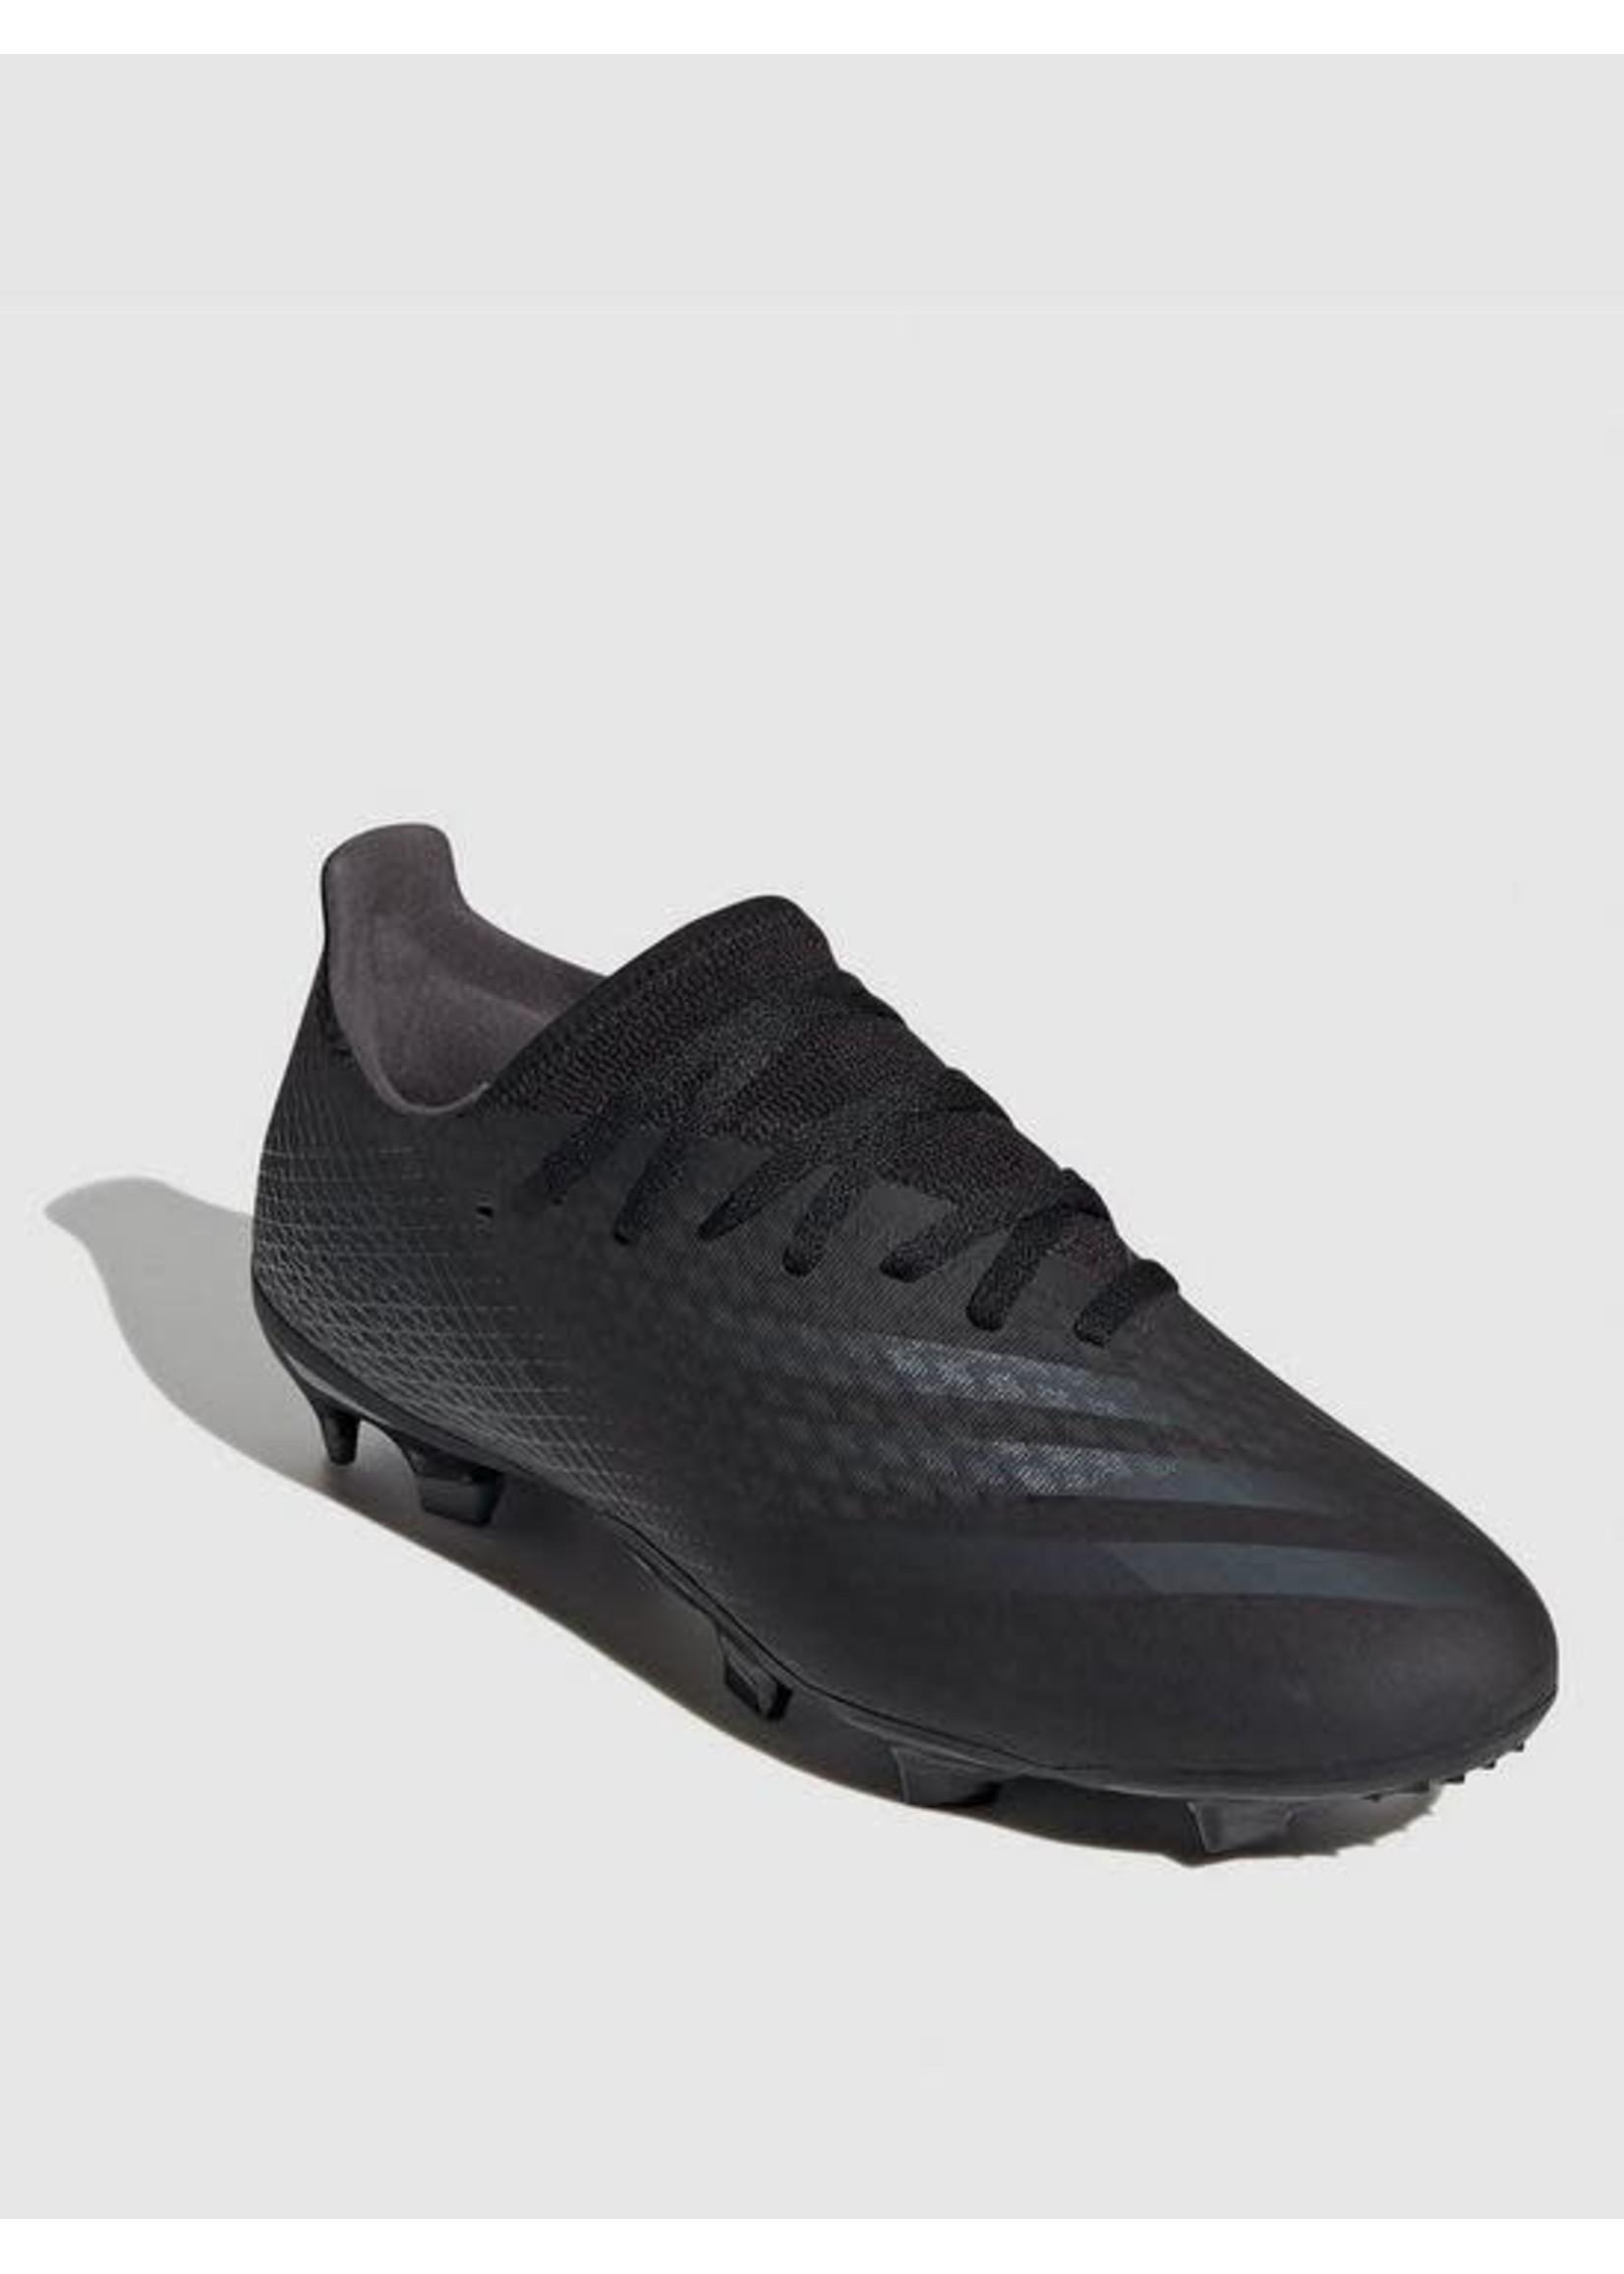 Adidas Adidas X Ghosted.3 FG Junior Football Boot, Black, (2021)